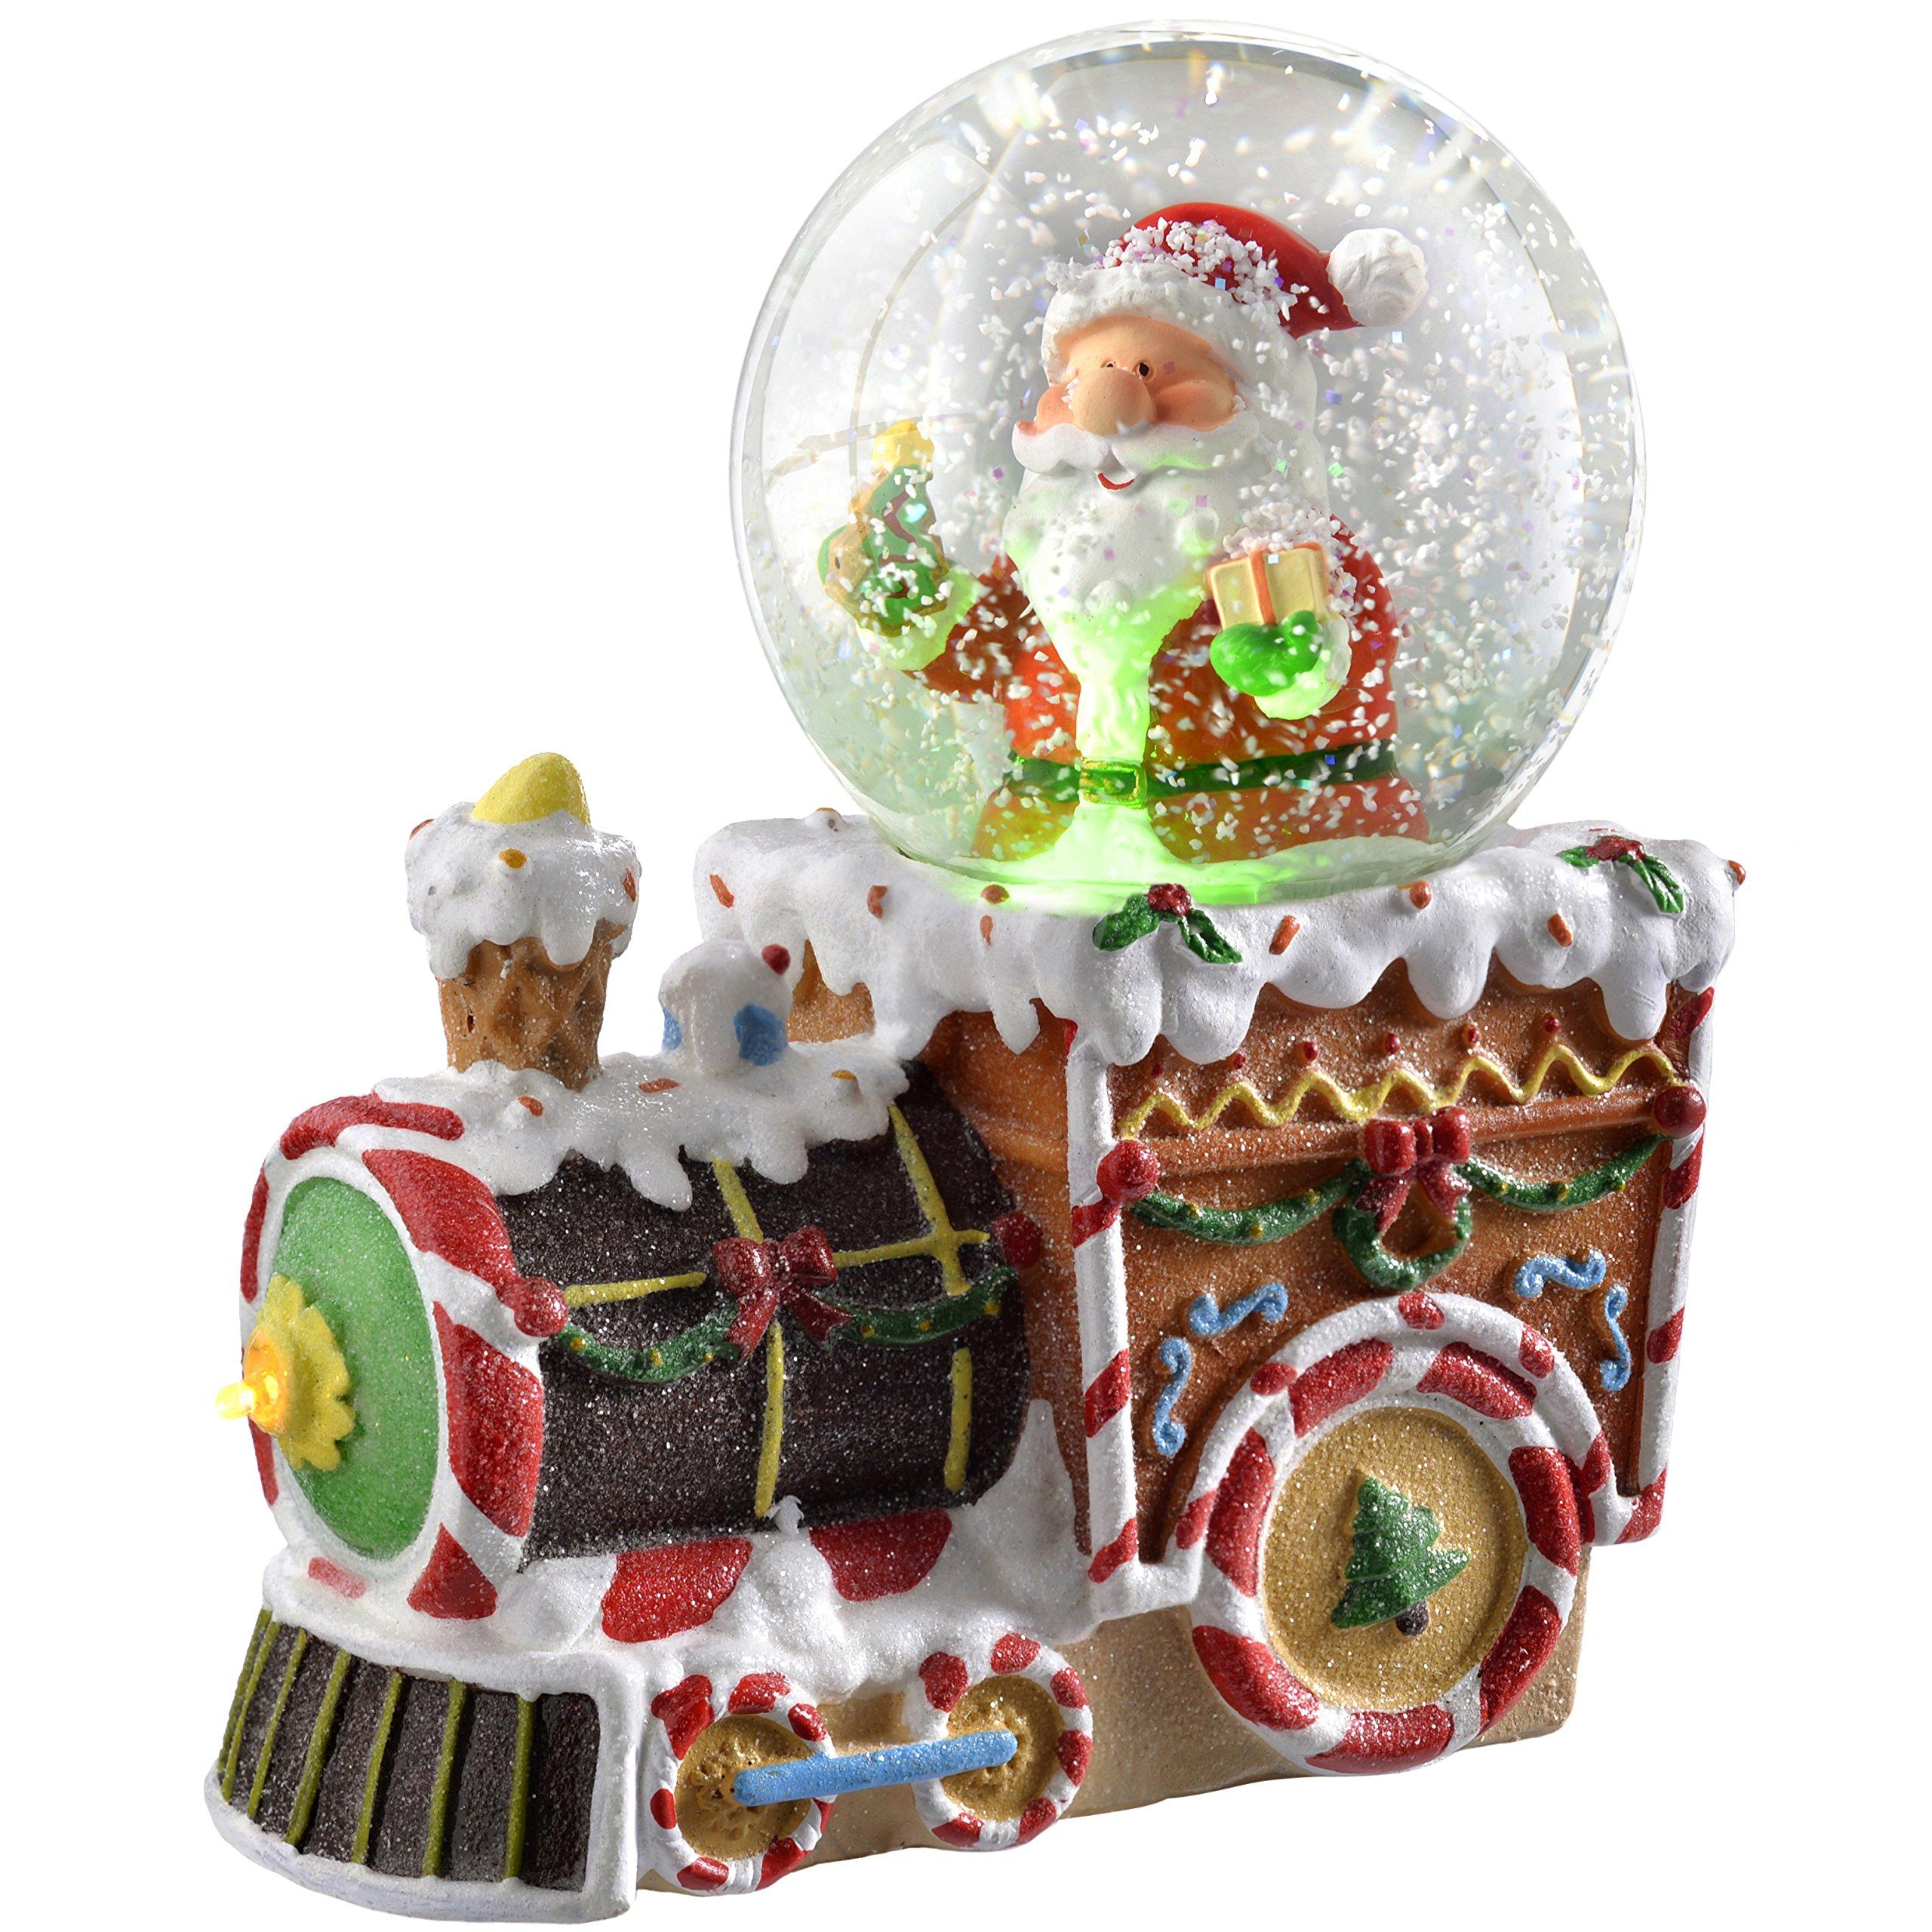 WeRChristmas Santa On Train Colour Changing Snow Globe, 16 Cm - Multi-Colour